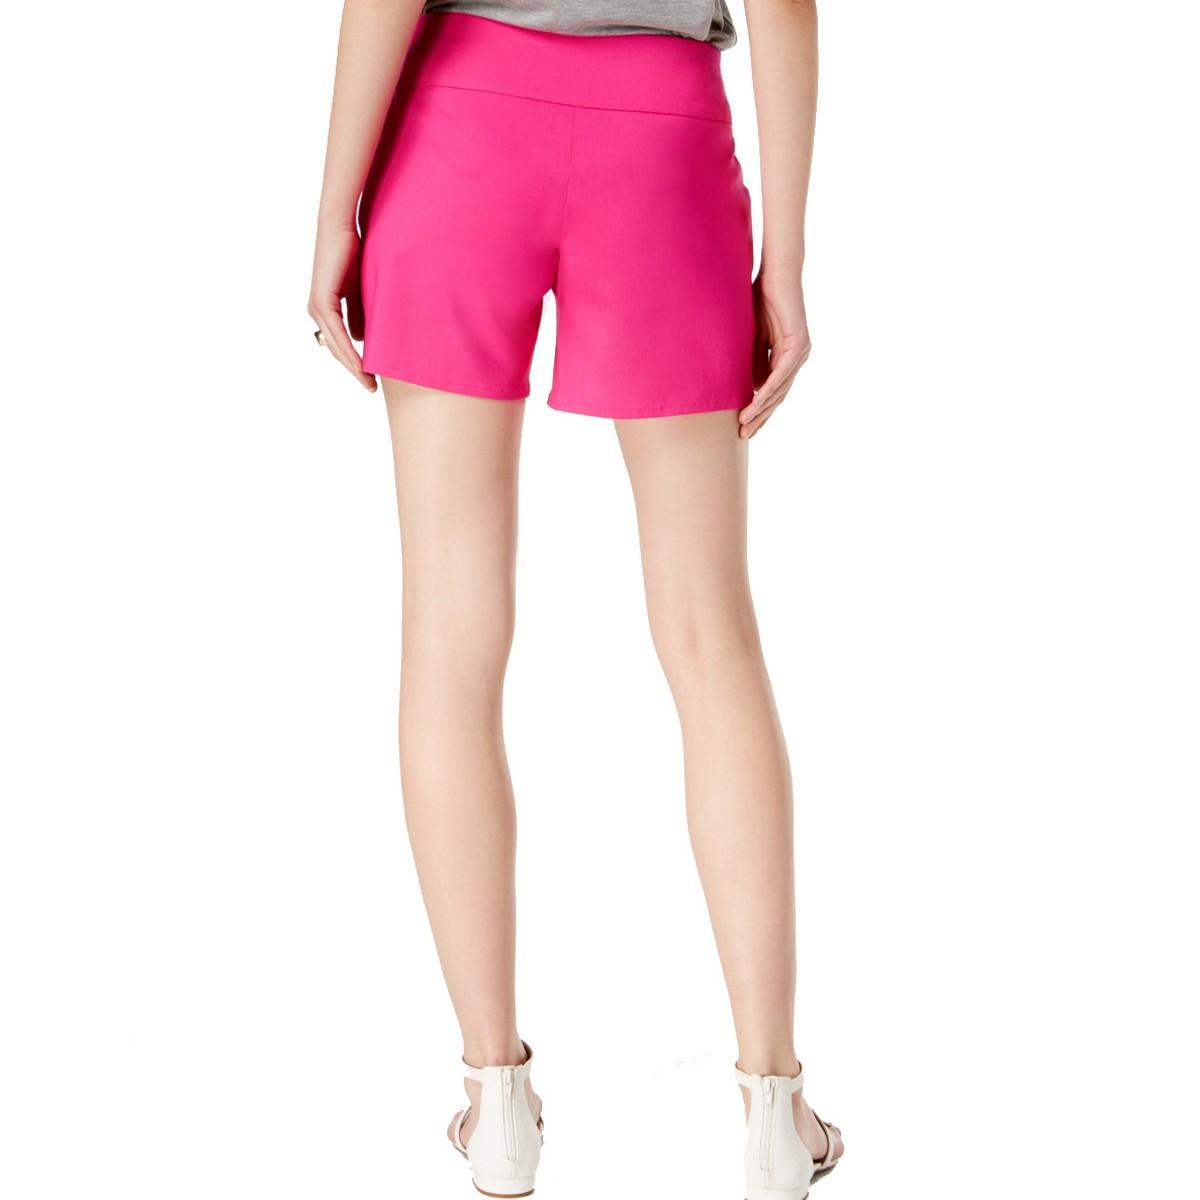 INC-NEW-Women-039-s-Pull-On-Curvy-Fit-Front-Pockets-Khaki-Chino-Shorts-TEDO thumbnail 6